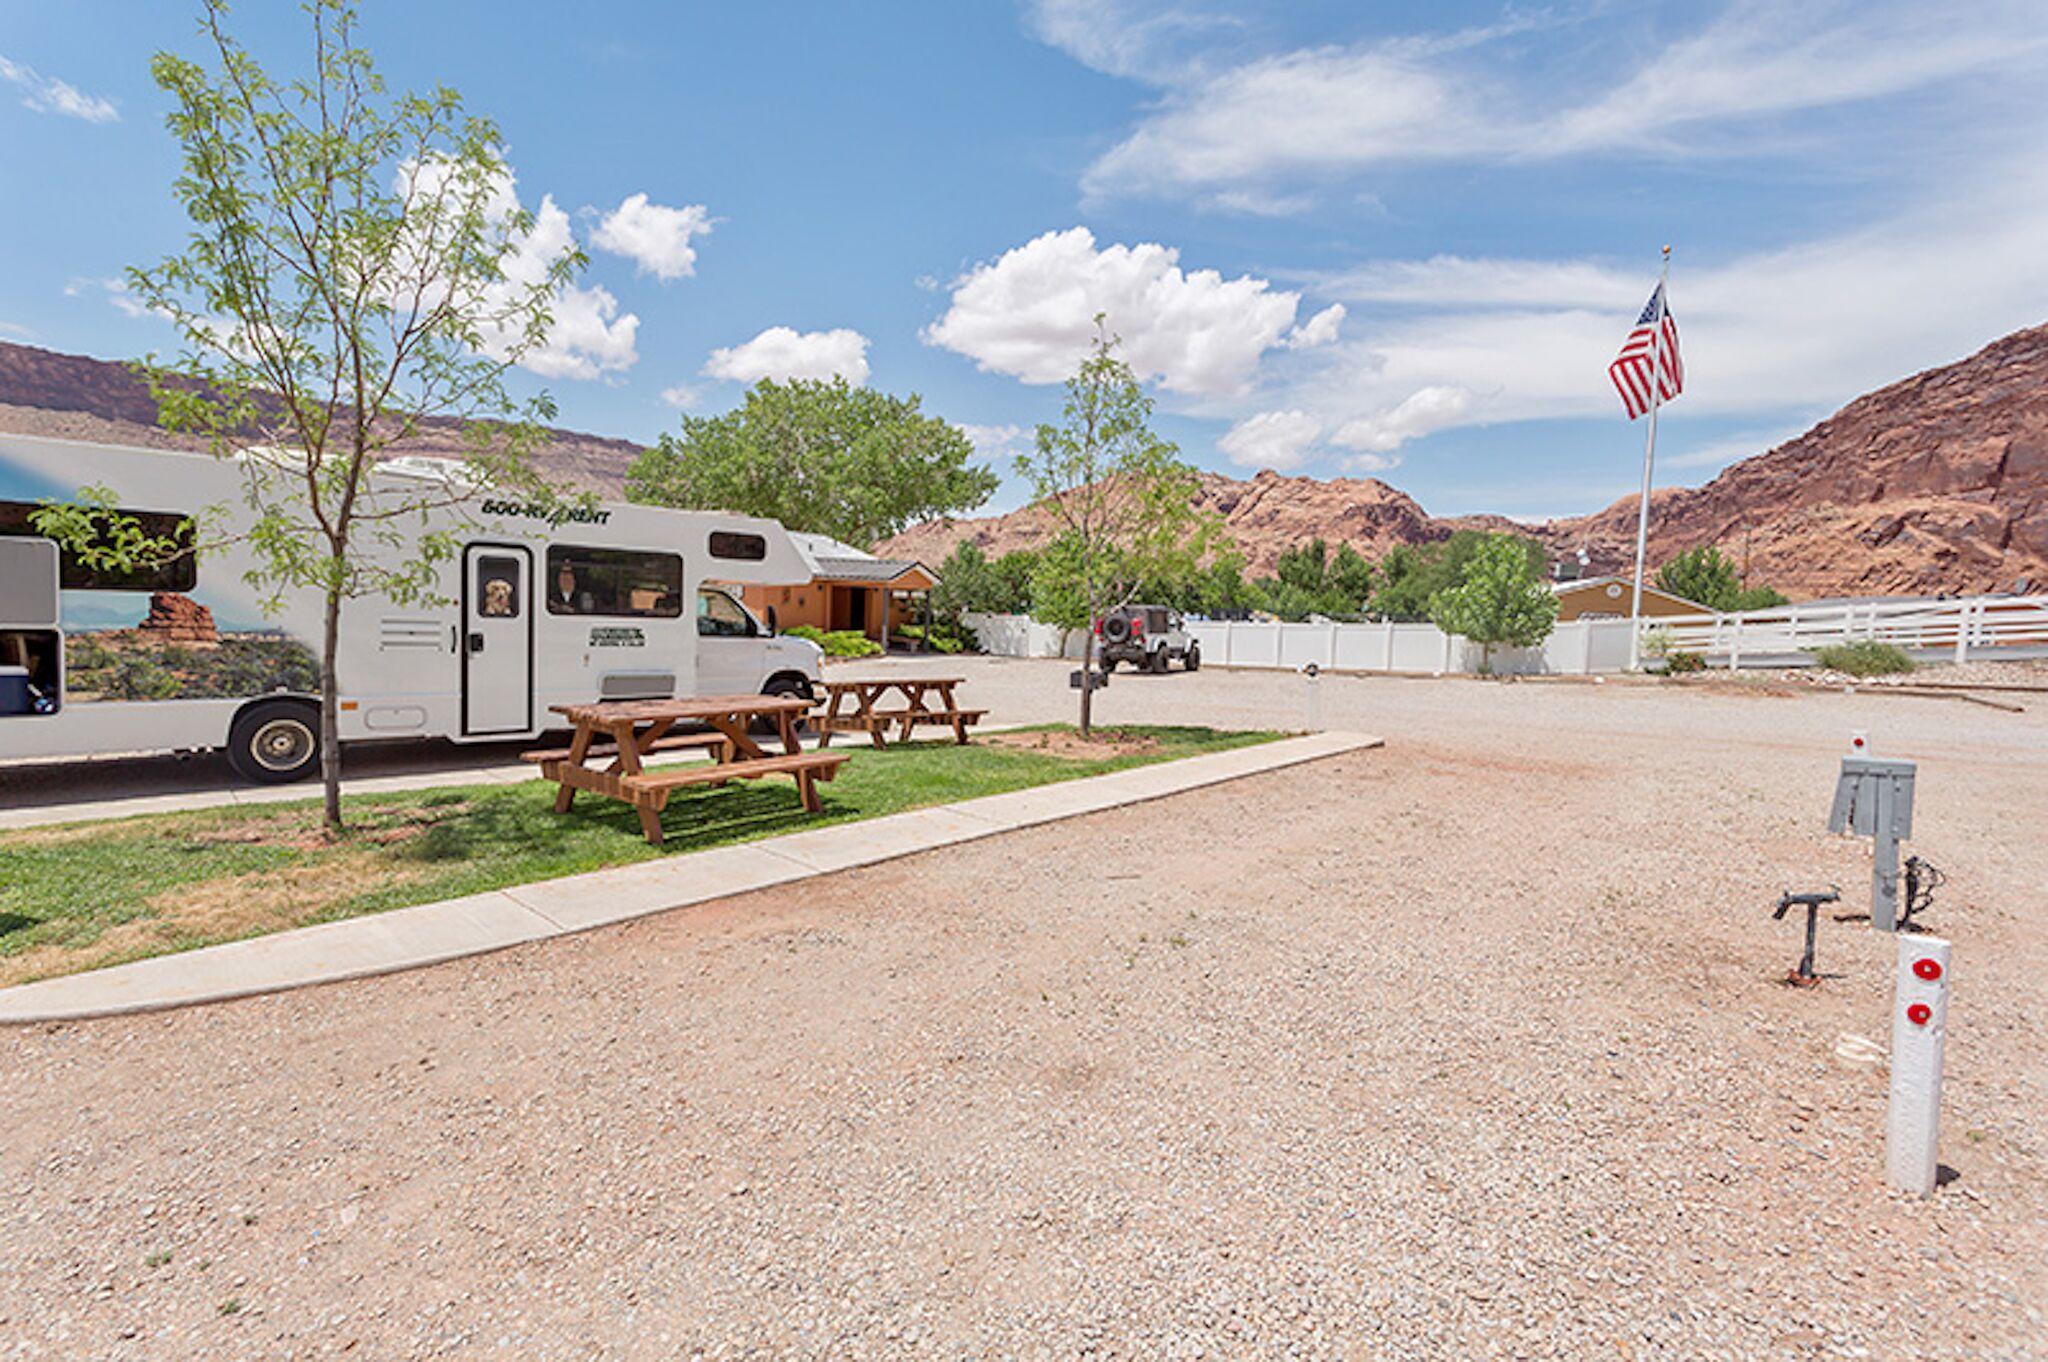 Moab Valley RV Resort & Campground